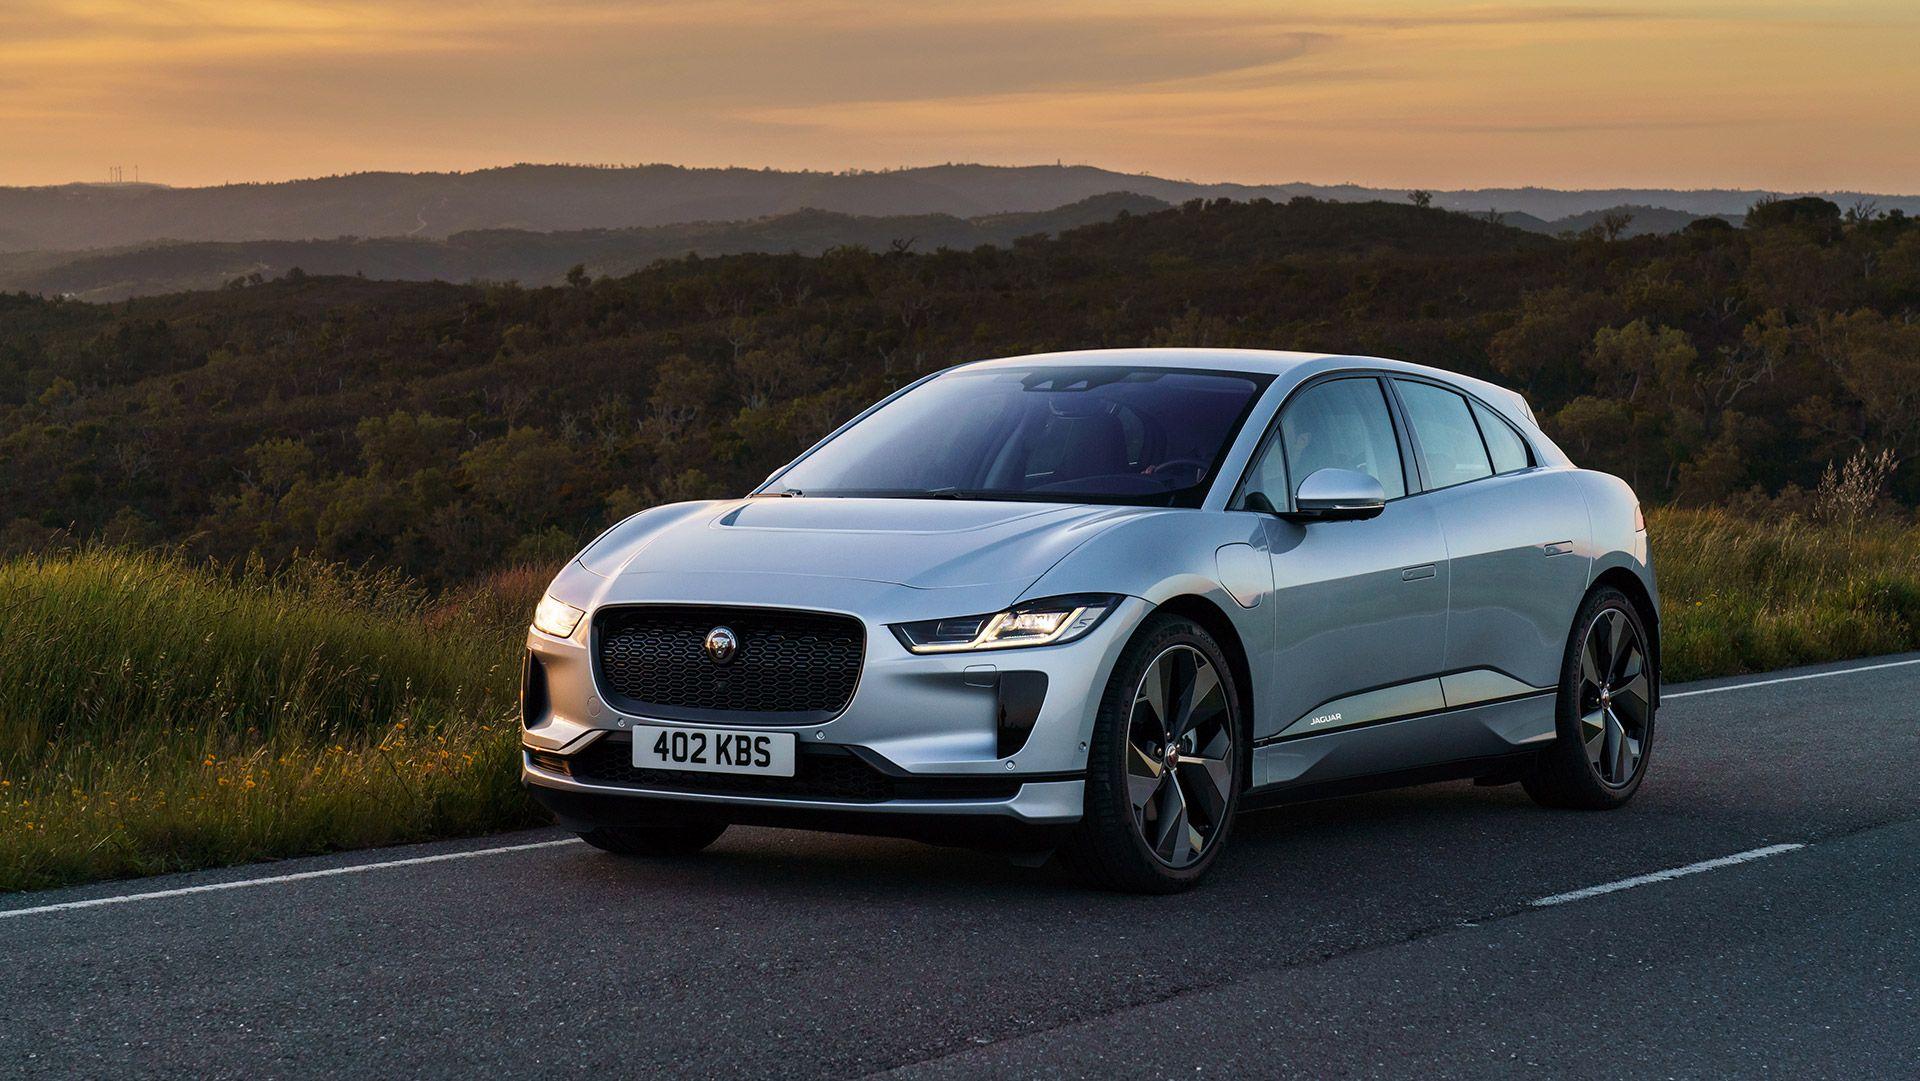 The Jaguar I Pace Ev Made Up Nearly Ten Per Cent Of Jaguar S Sales Last Month The Electric Crossover Made Up Nearly Ten Per Cent Of J Jaguar Car Car Model Car